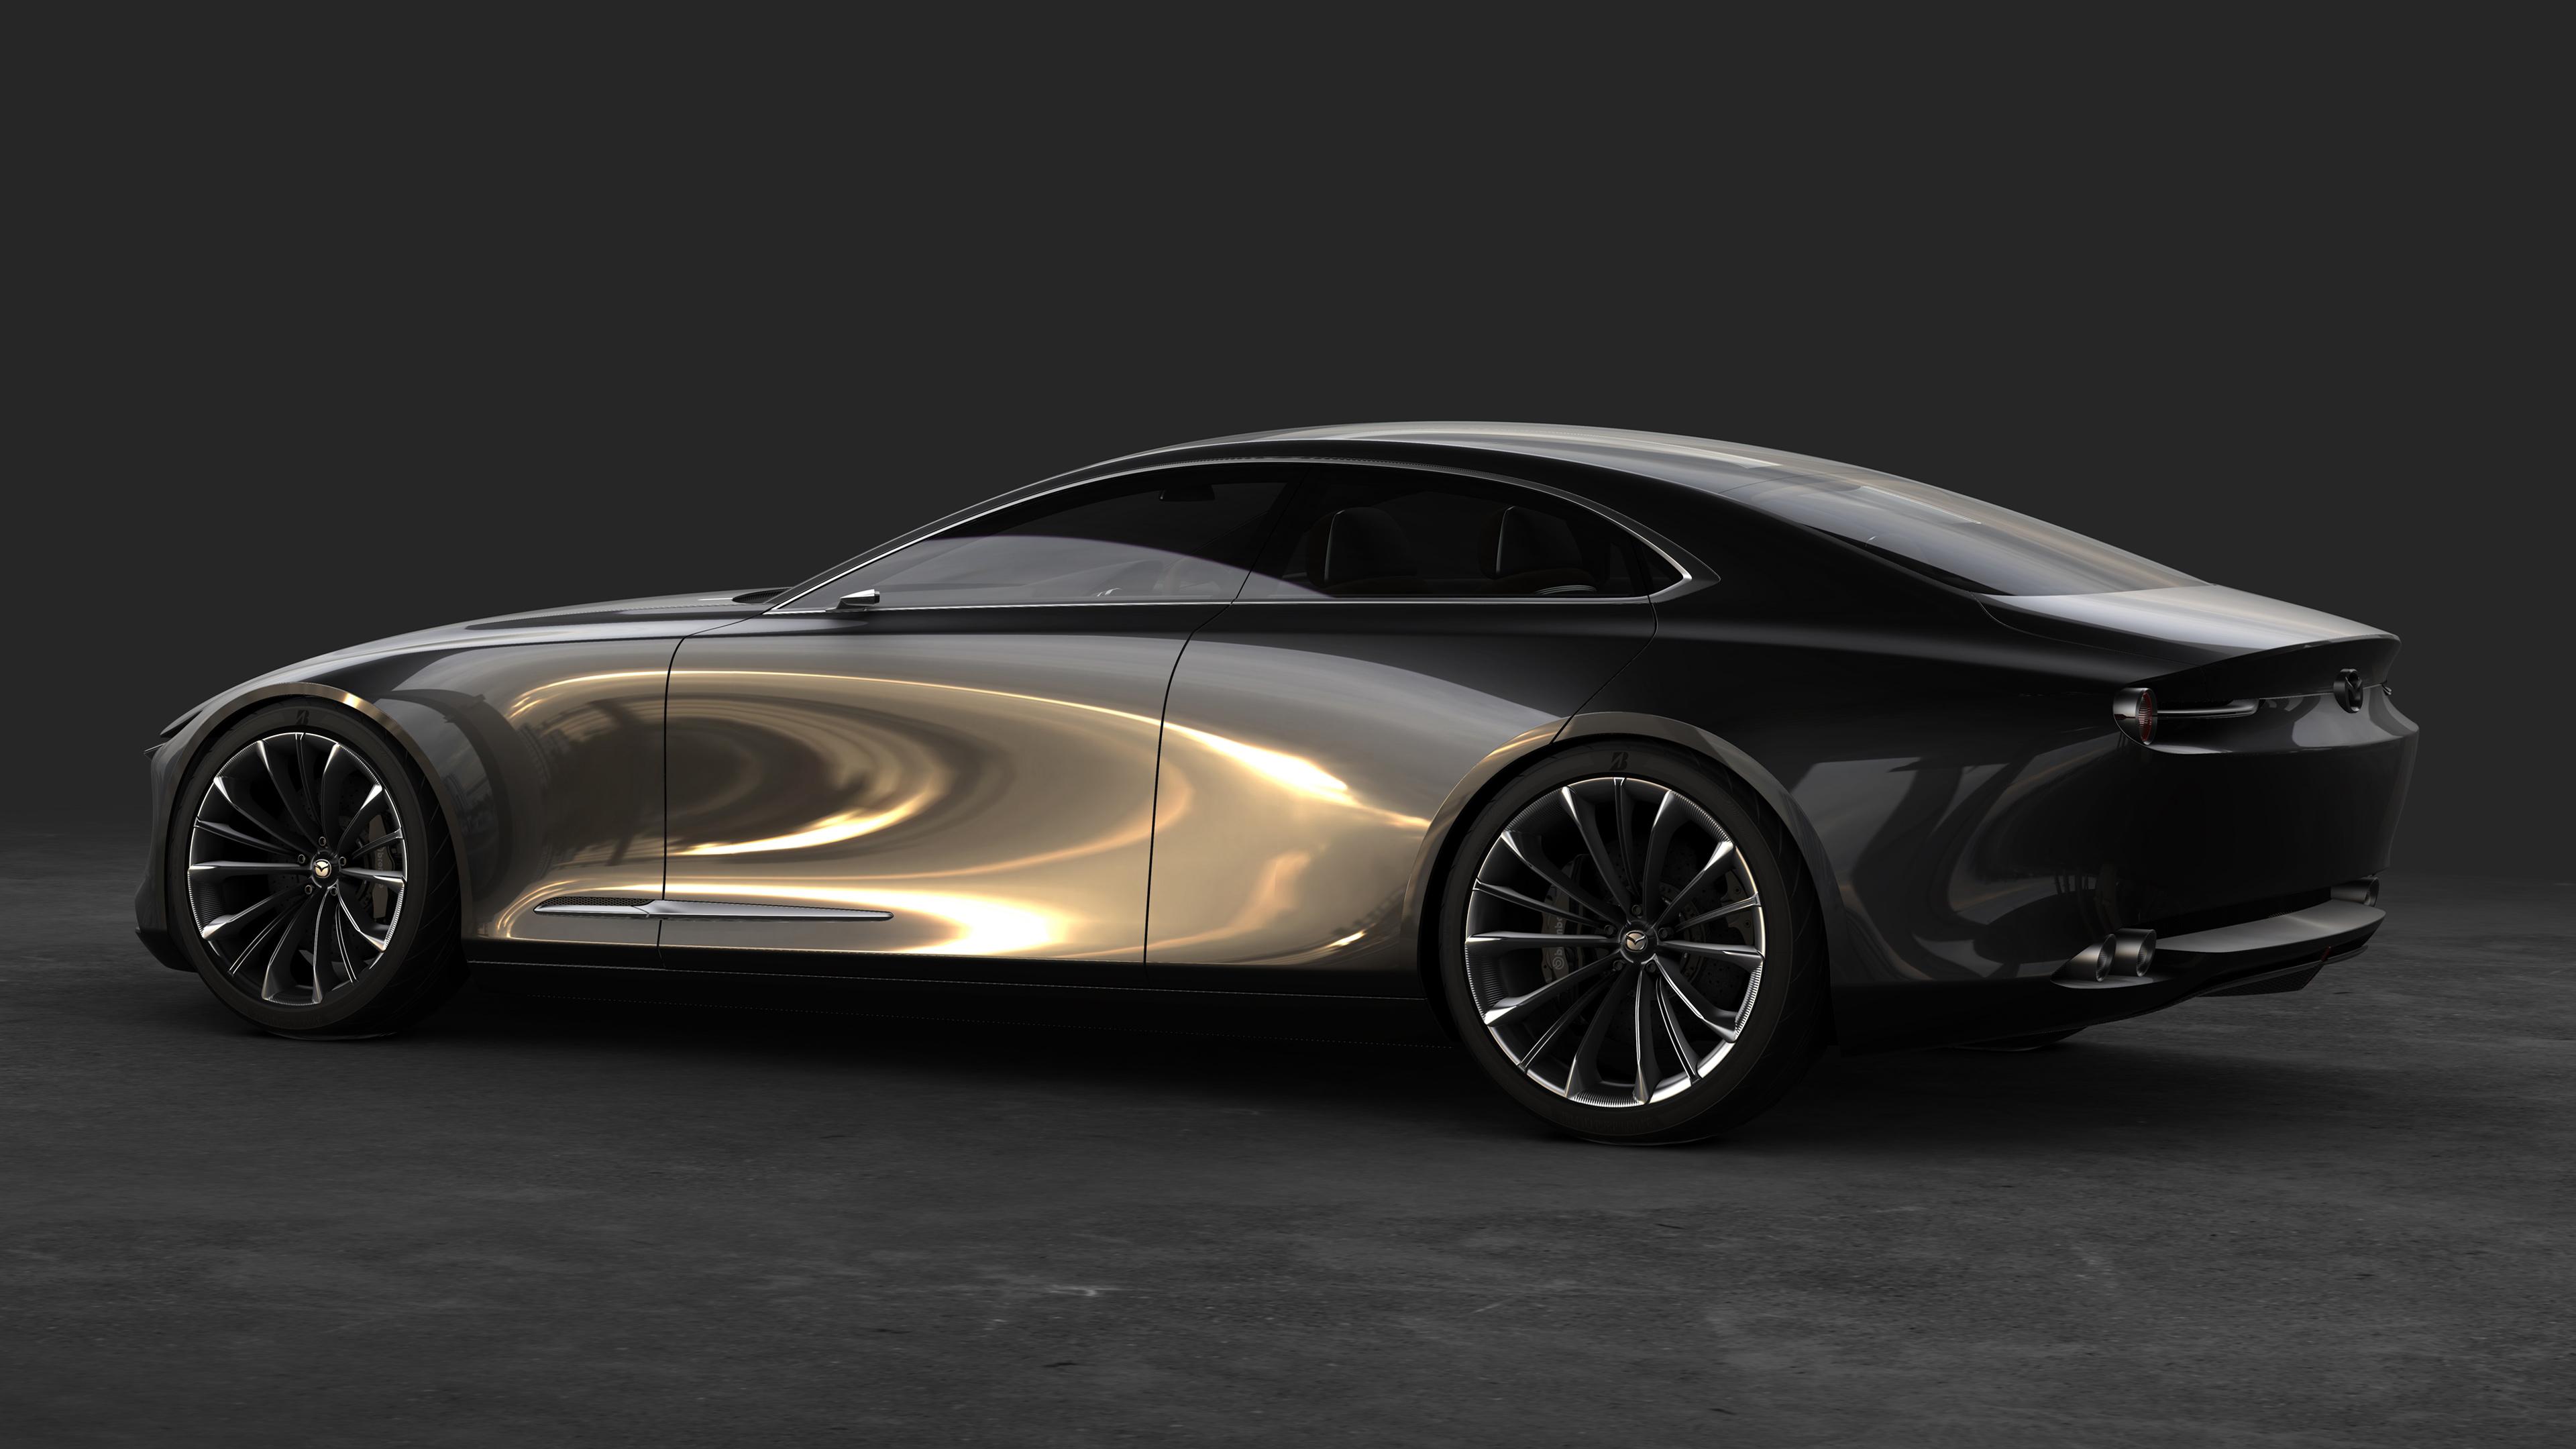 8k Car Wallpaper Download Mazda Vision Coupe Concept 4k Wallpaper Hd Car